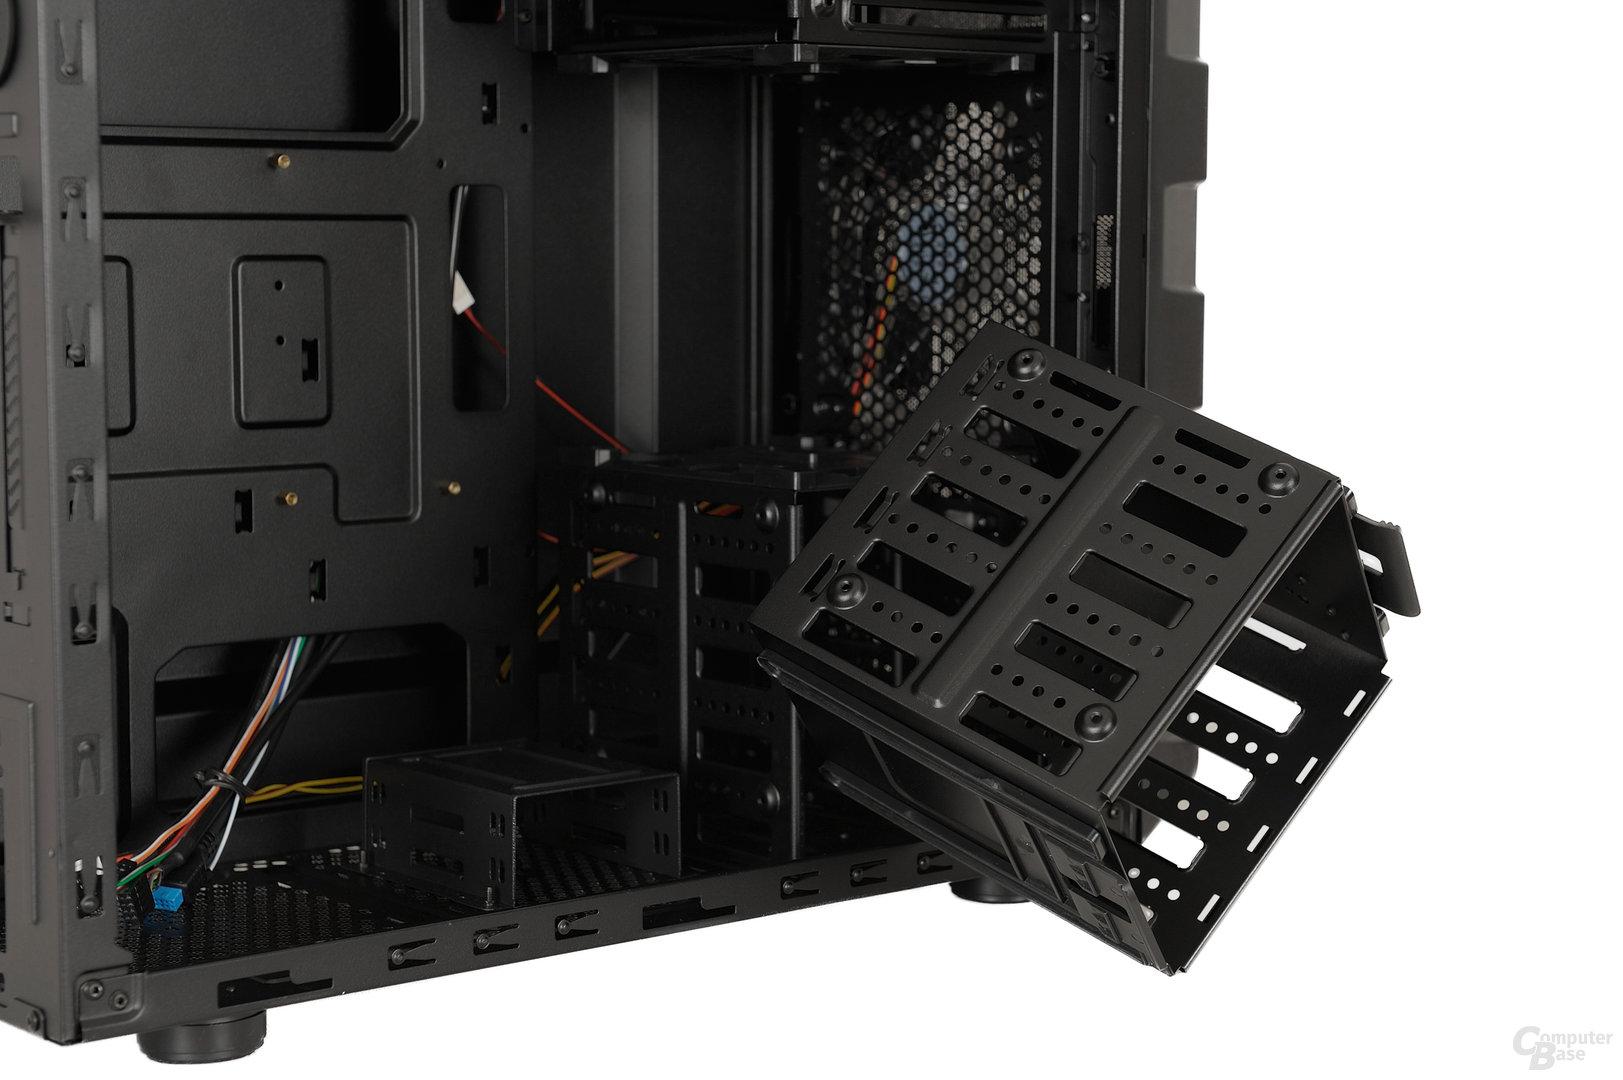 Enermax Ostrog GT - Entfernter HDD-Käfig